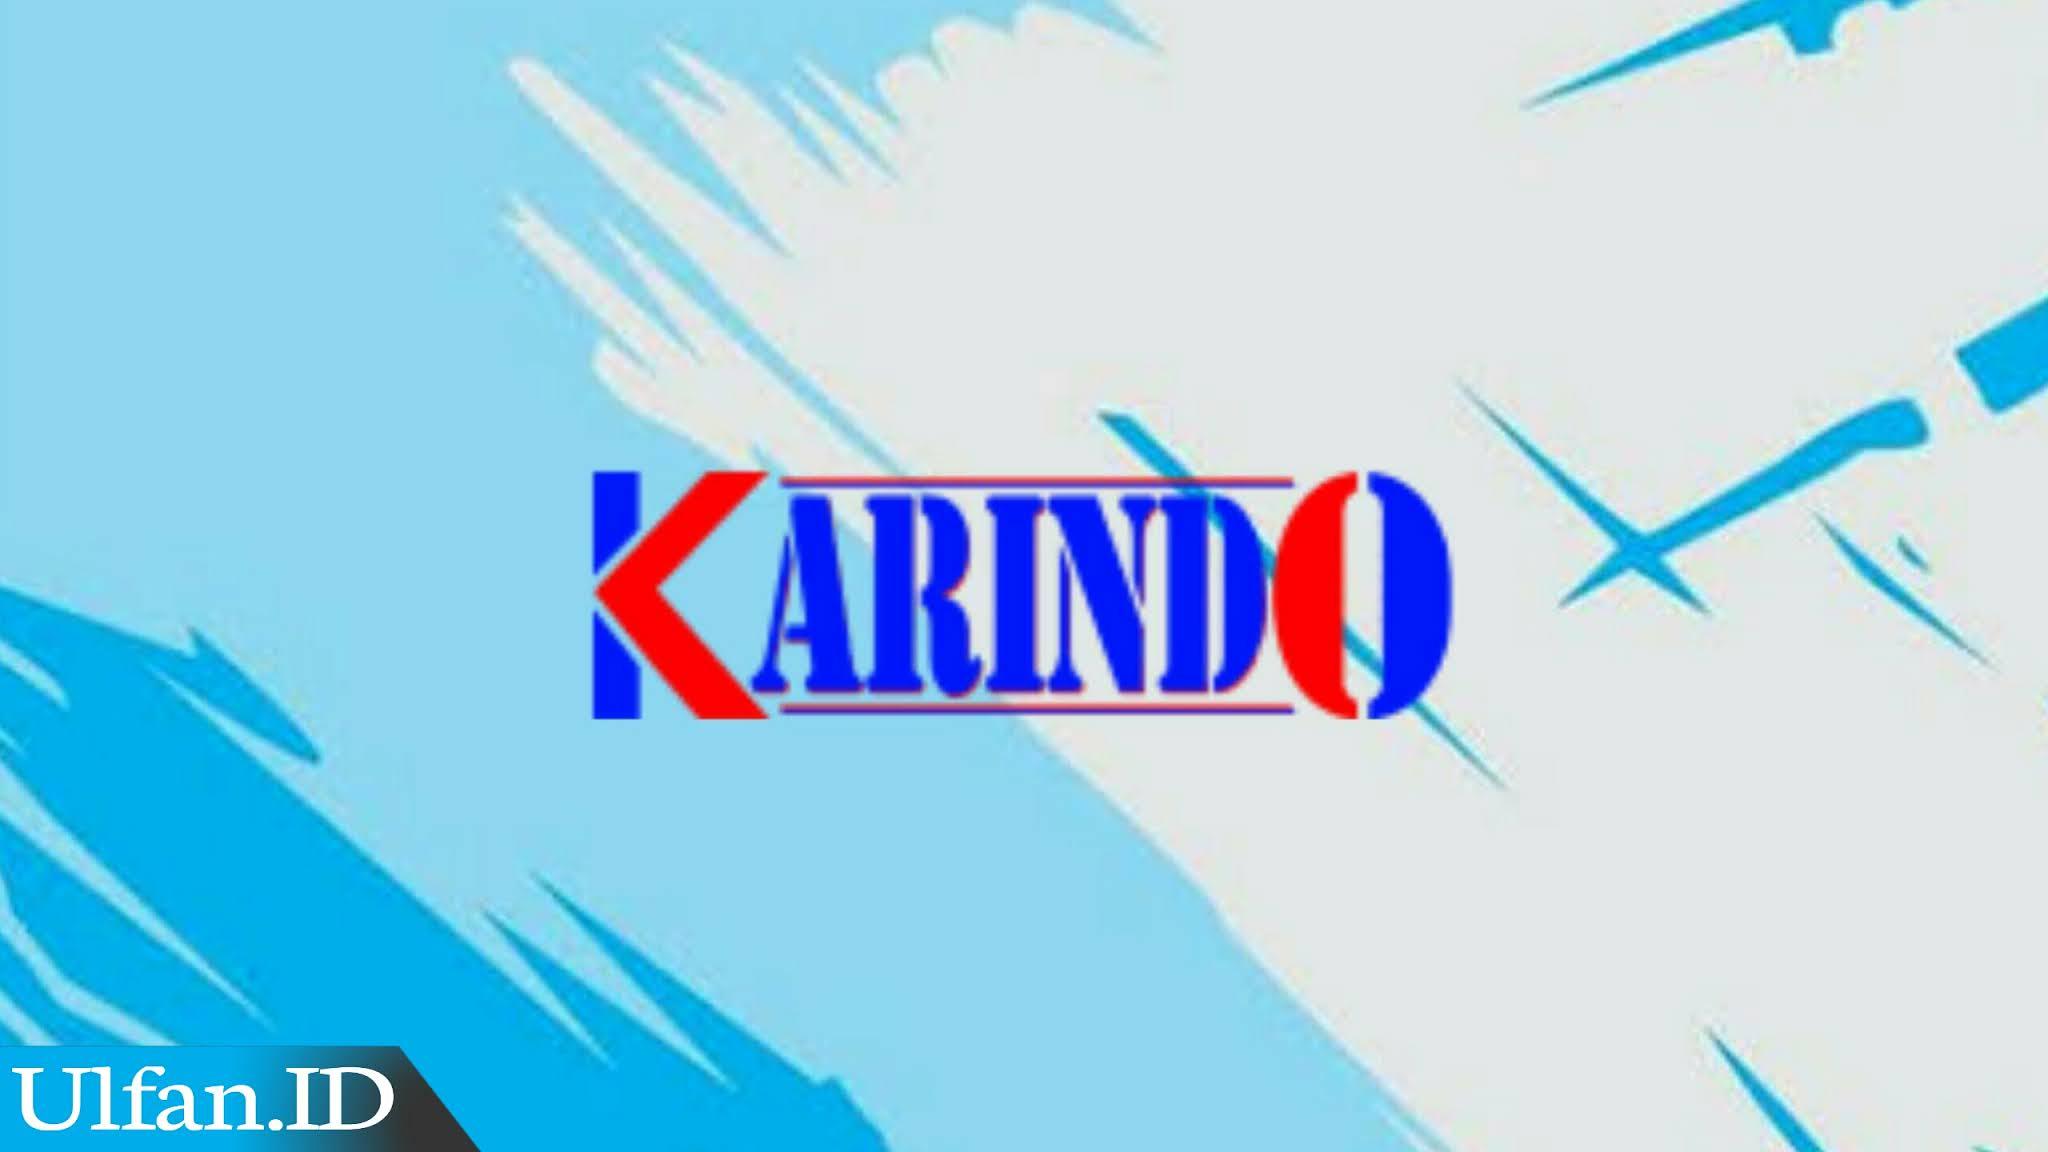 Aplikasi Karindo Pulsa dan Kuota